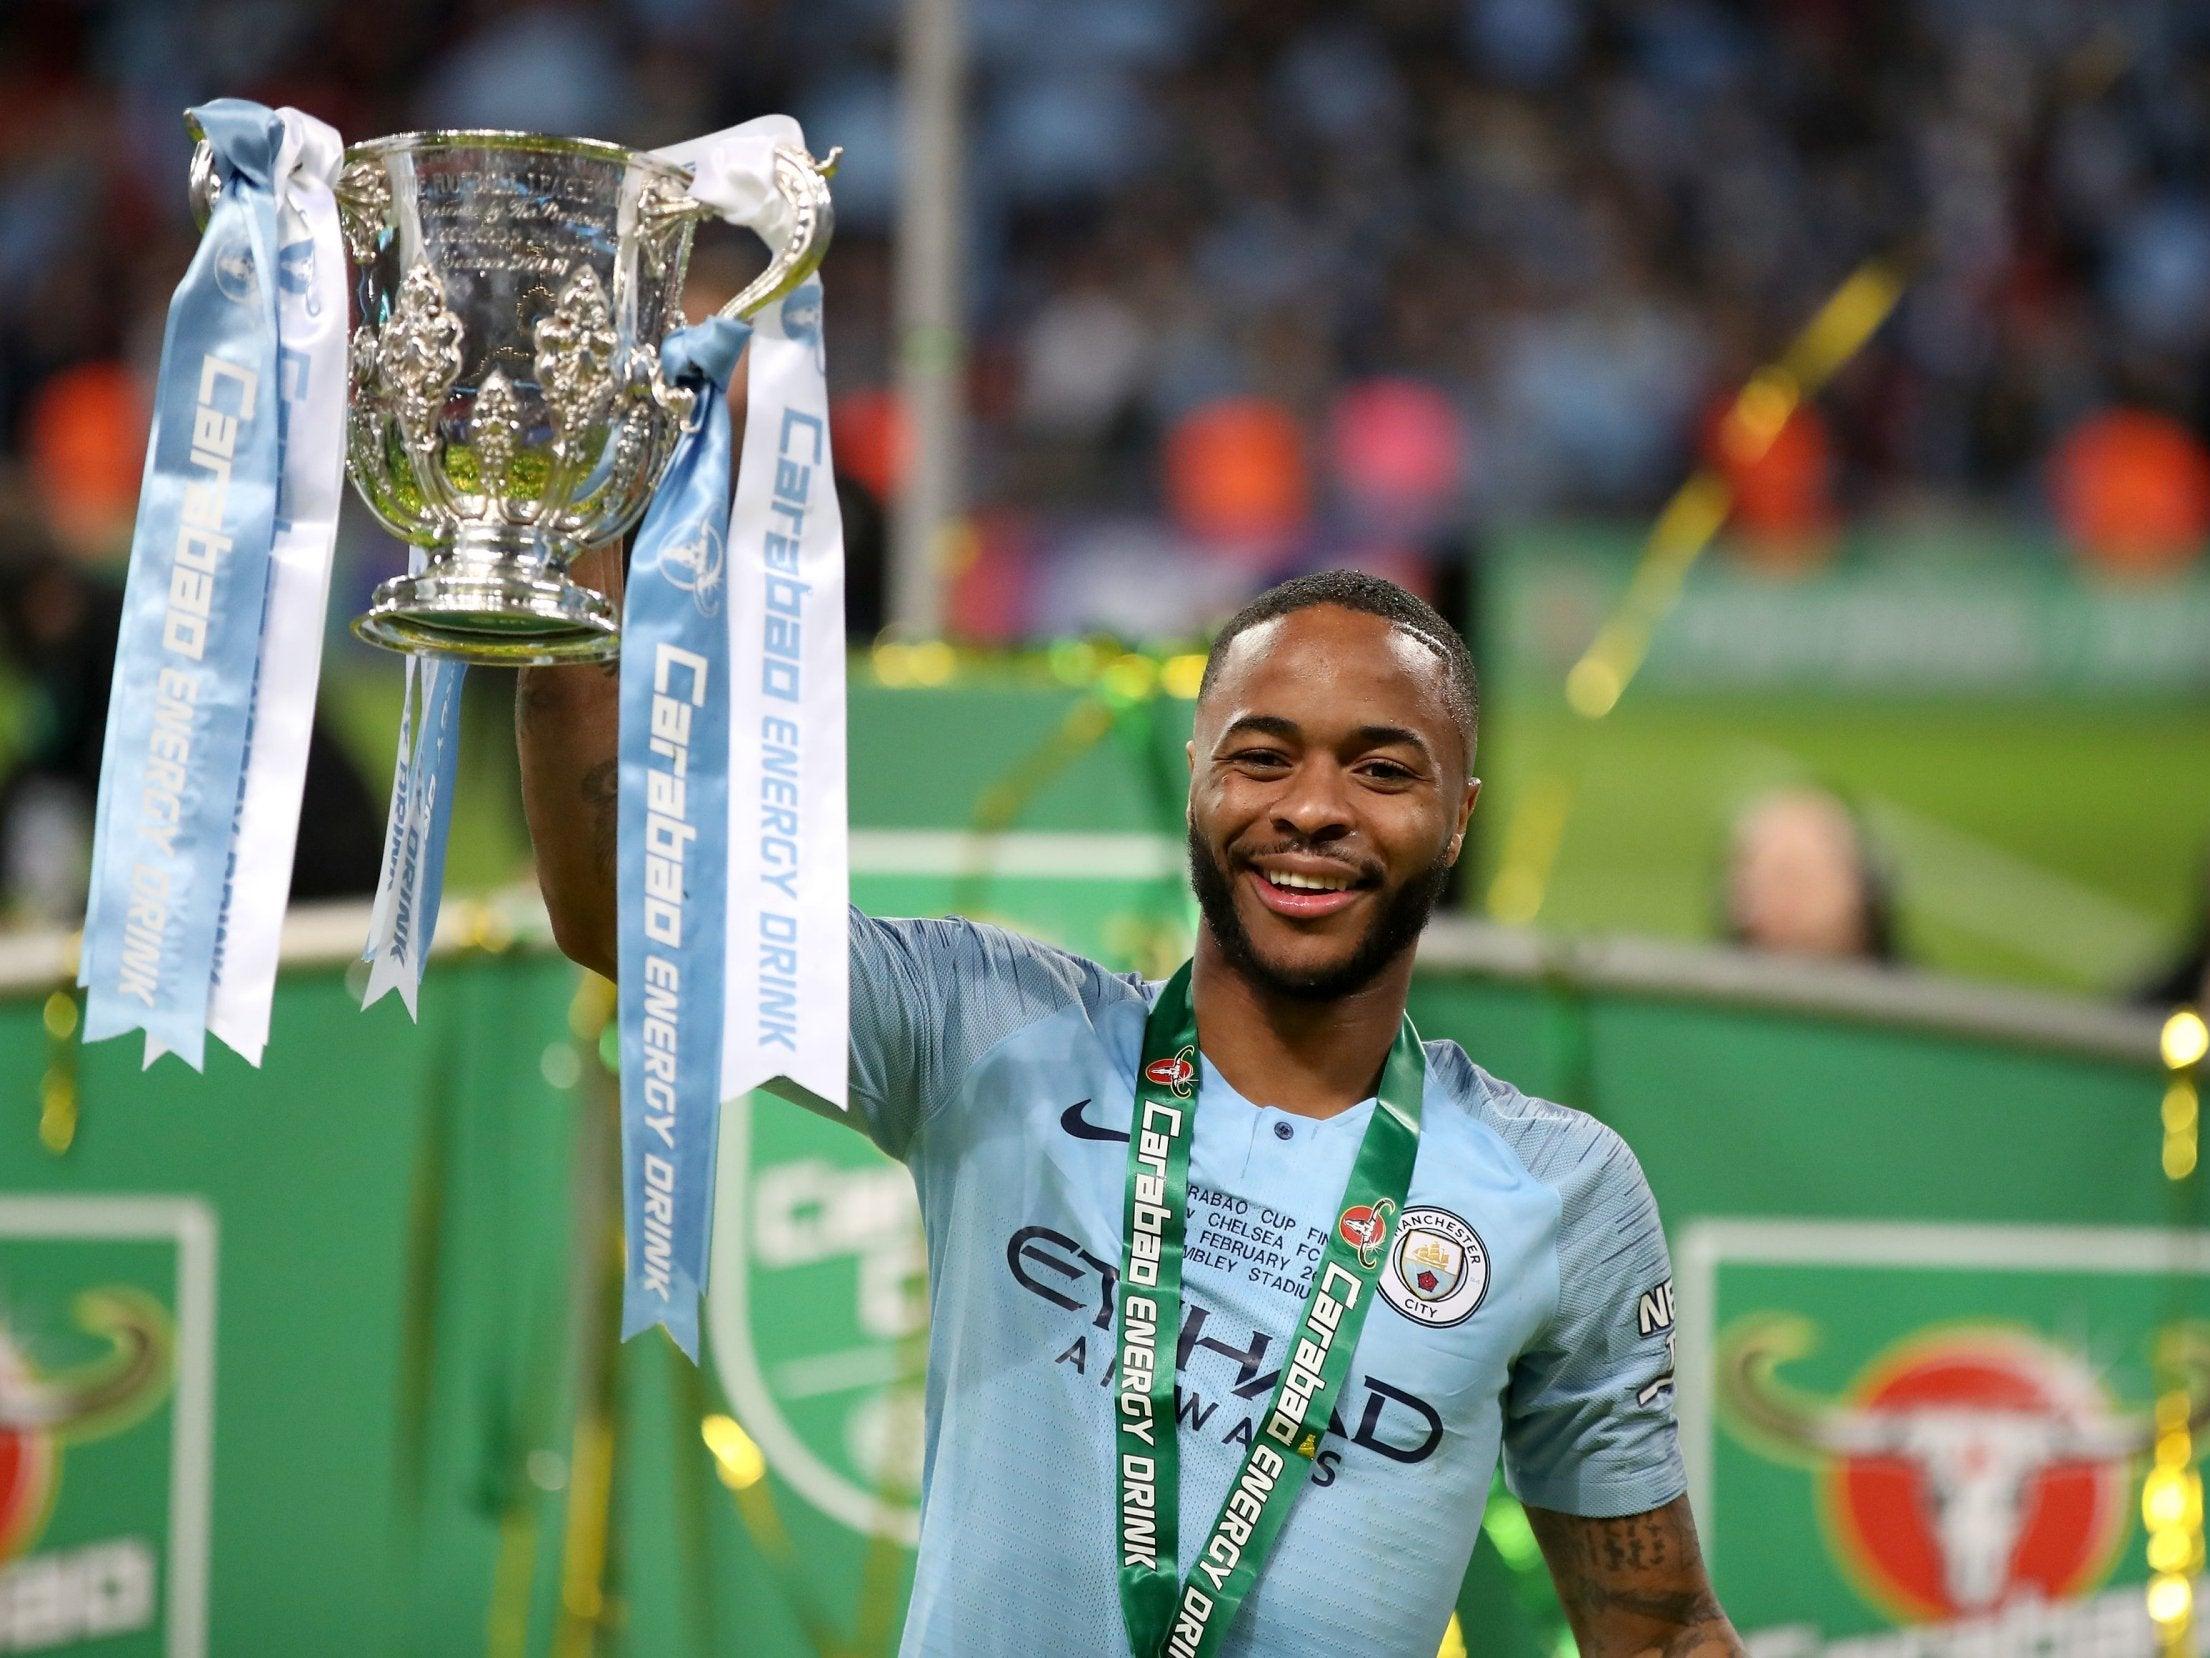 FWA Footballer of the Year 2019: Raheem Sterling wins